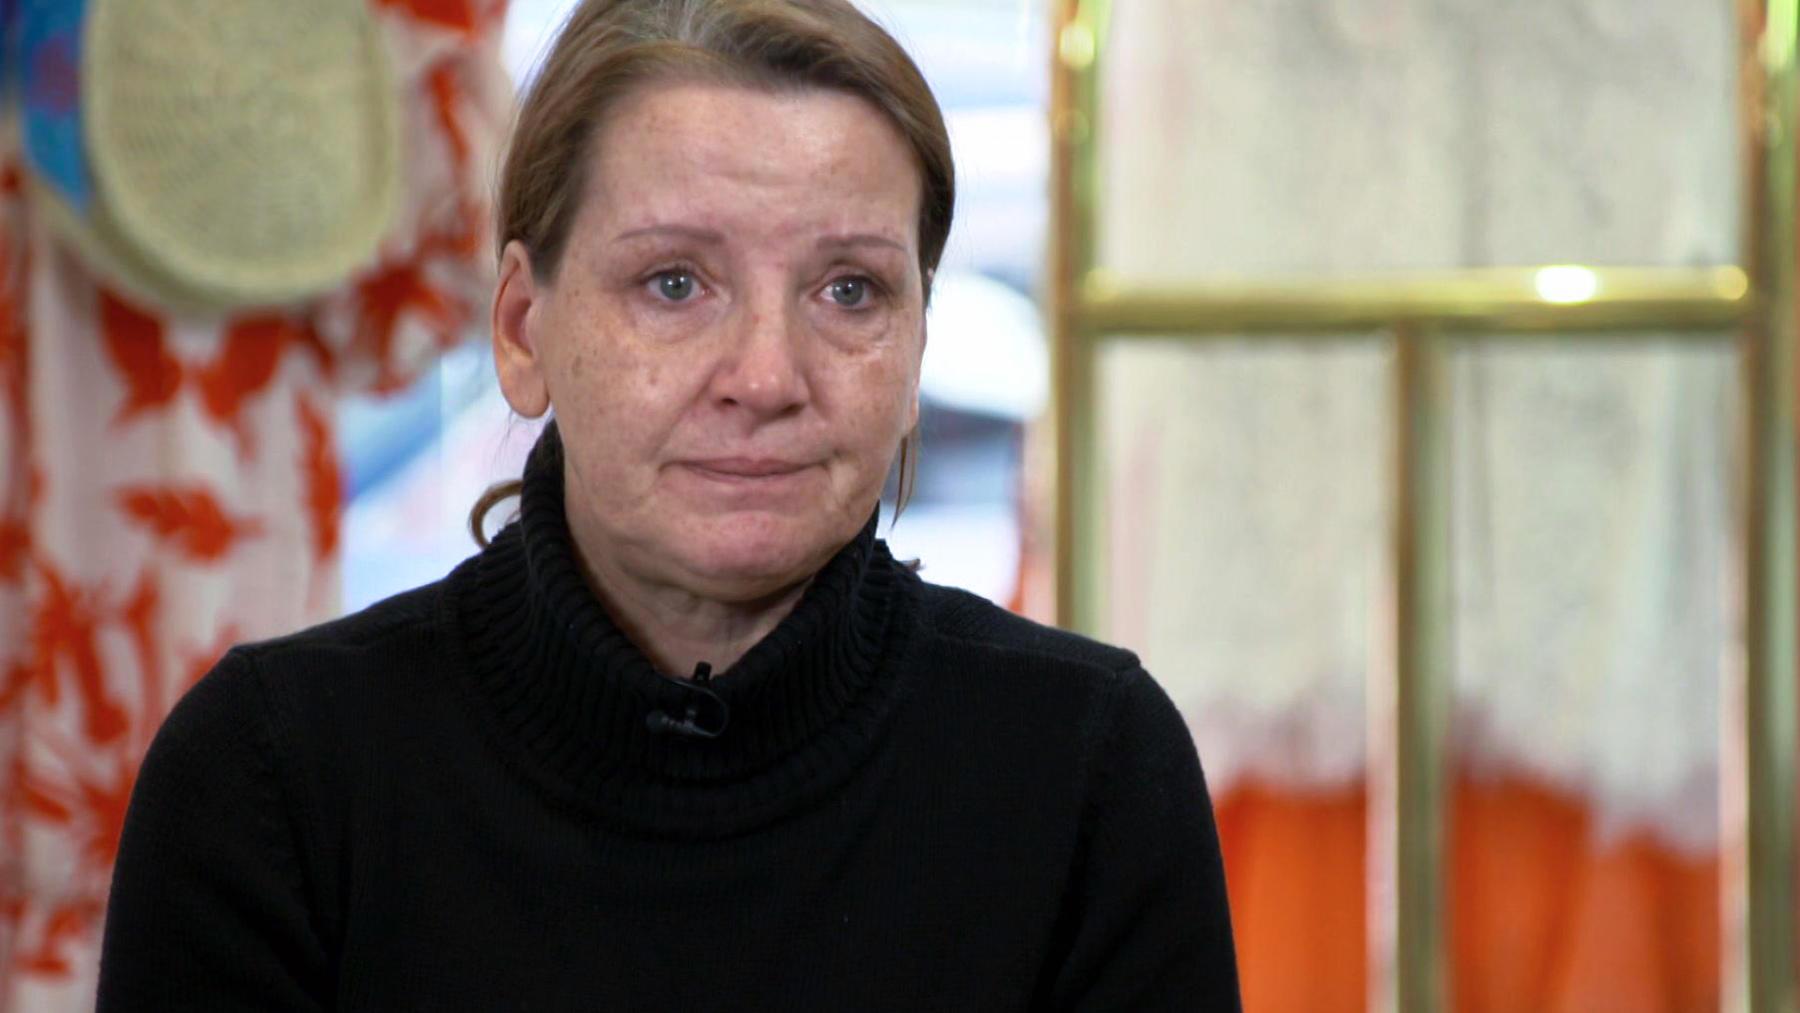 Andrea, Penzberg (Bayern) - Umstyling - Miyabi Kawai